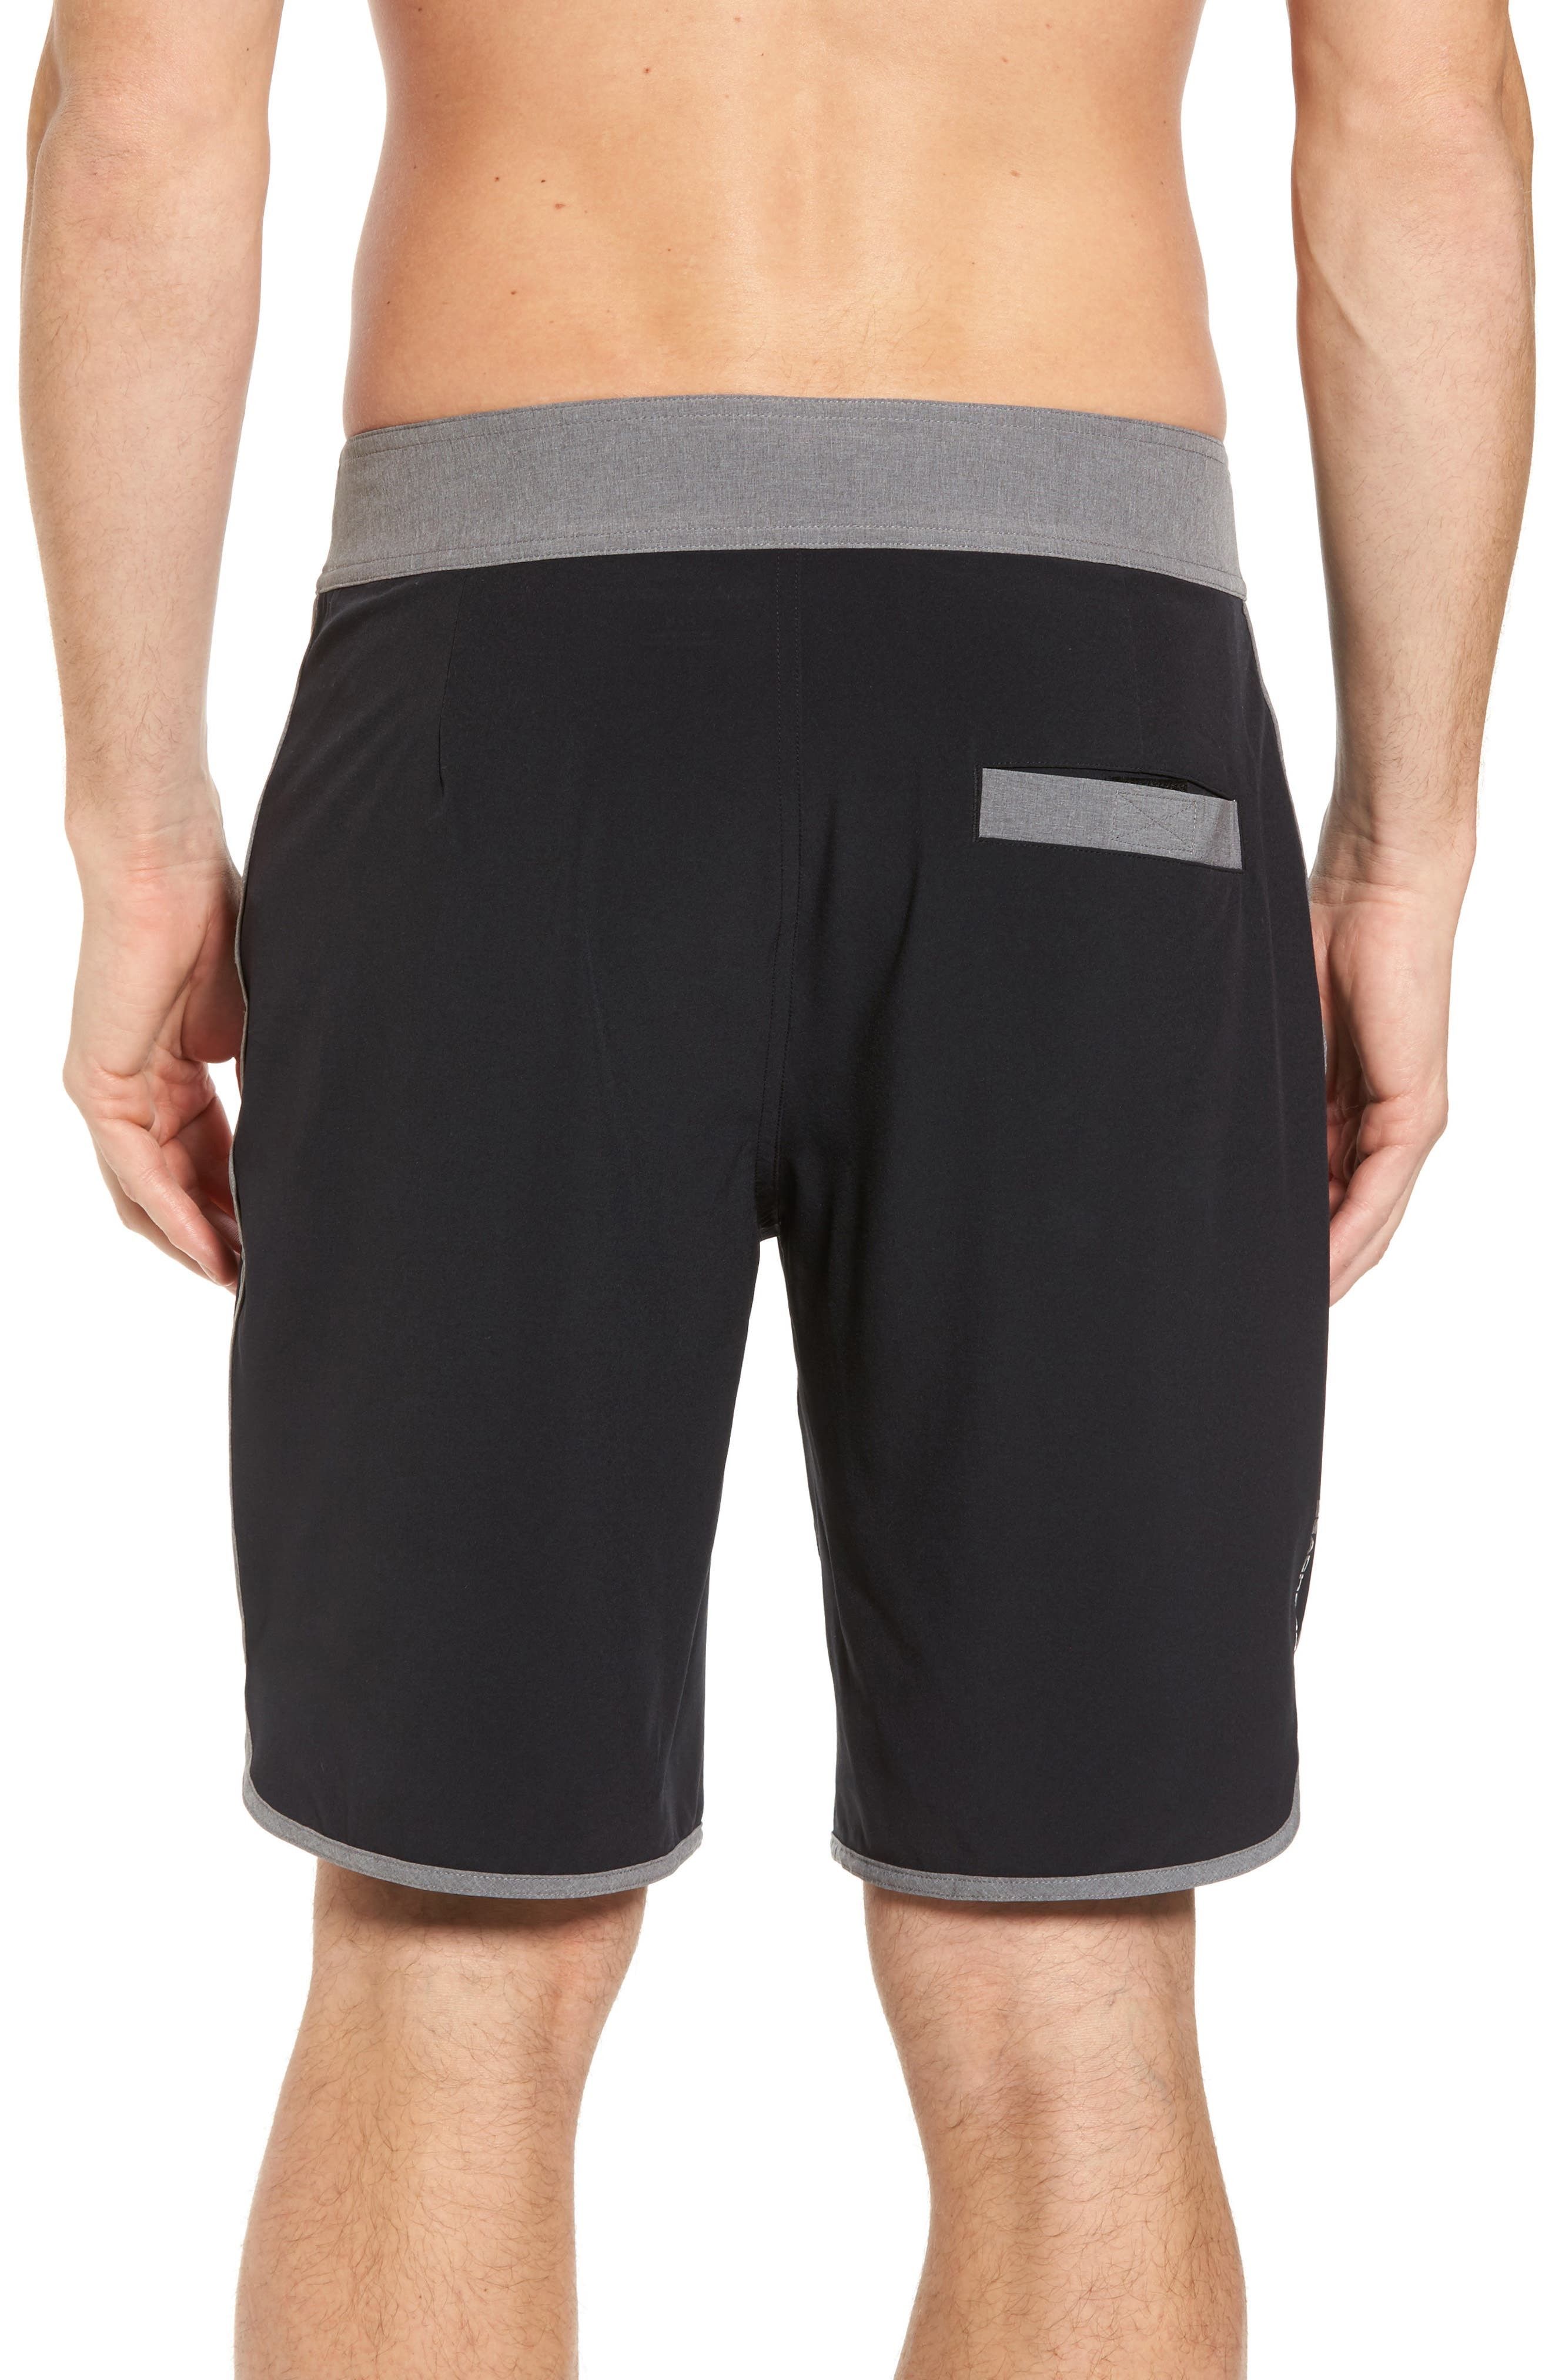 Flex Hybrid Athletic Shorts,                             Alternate thumbnail 2, color,                             Black